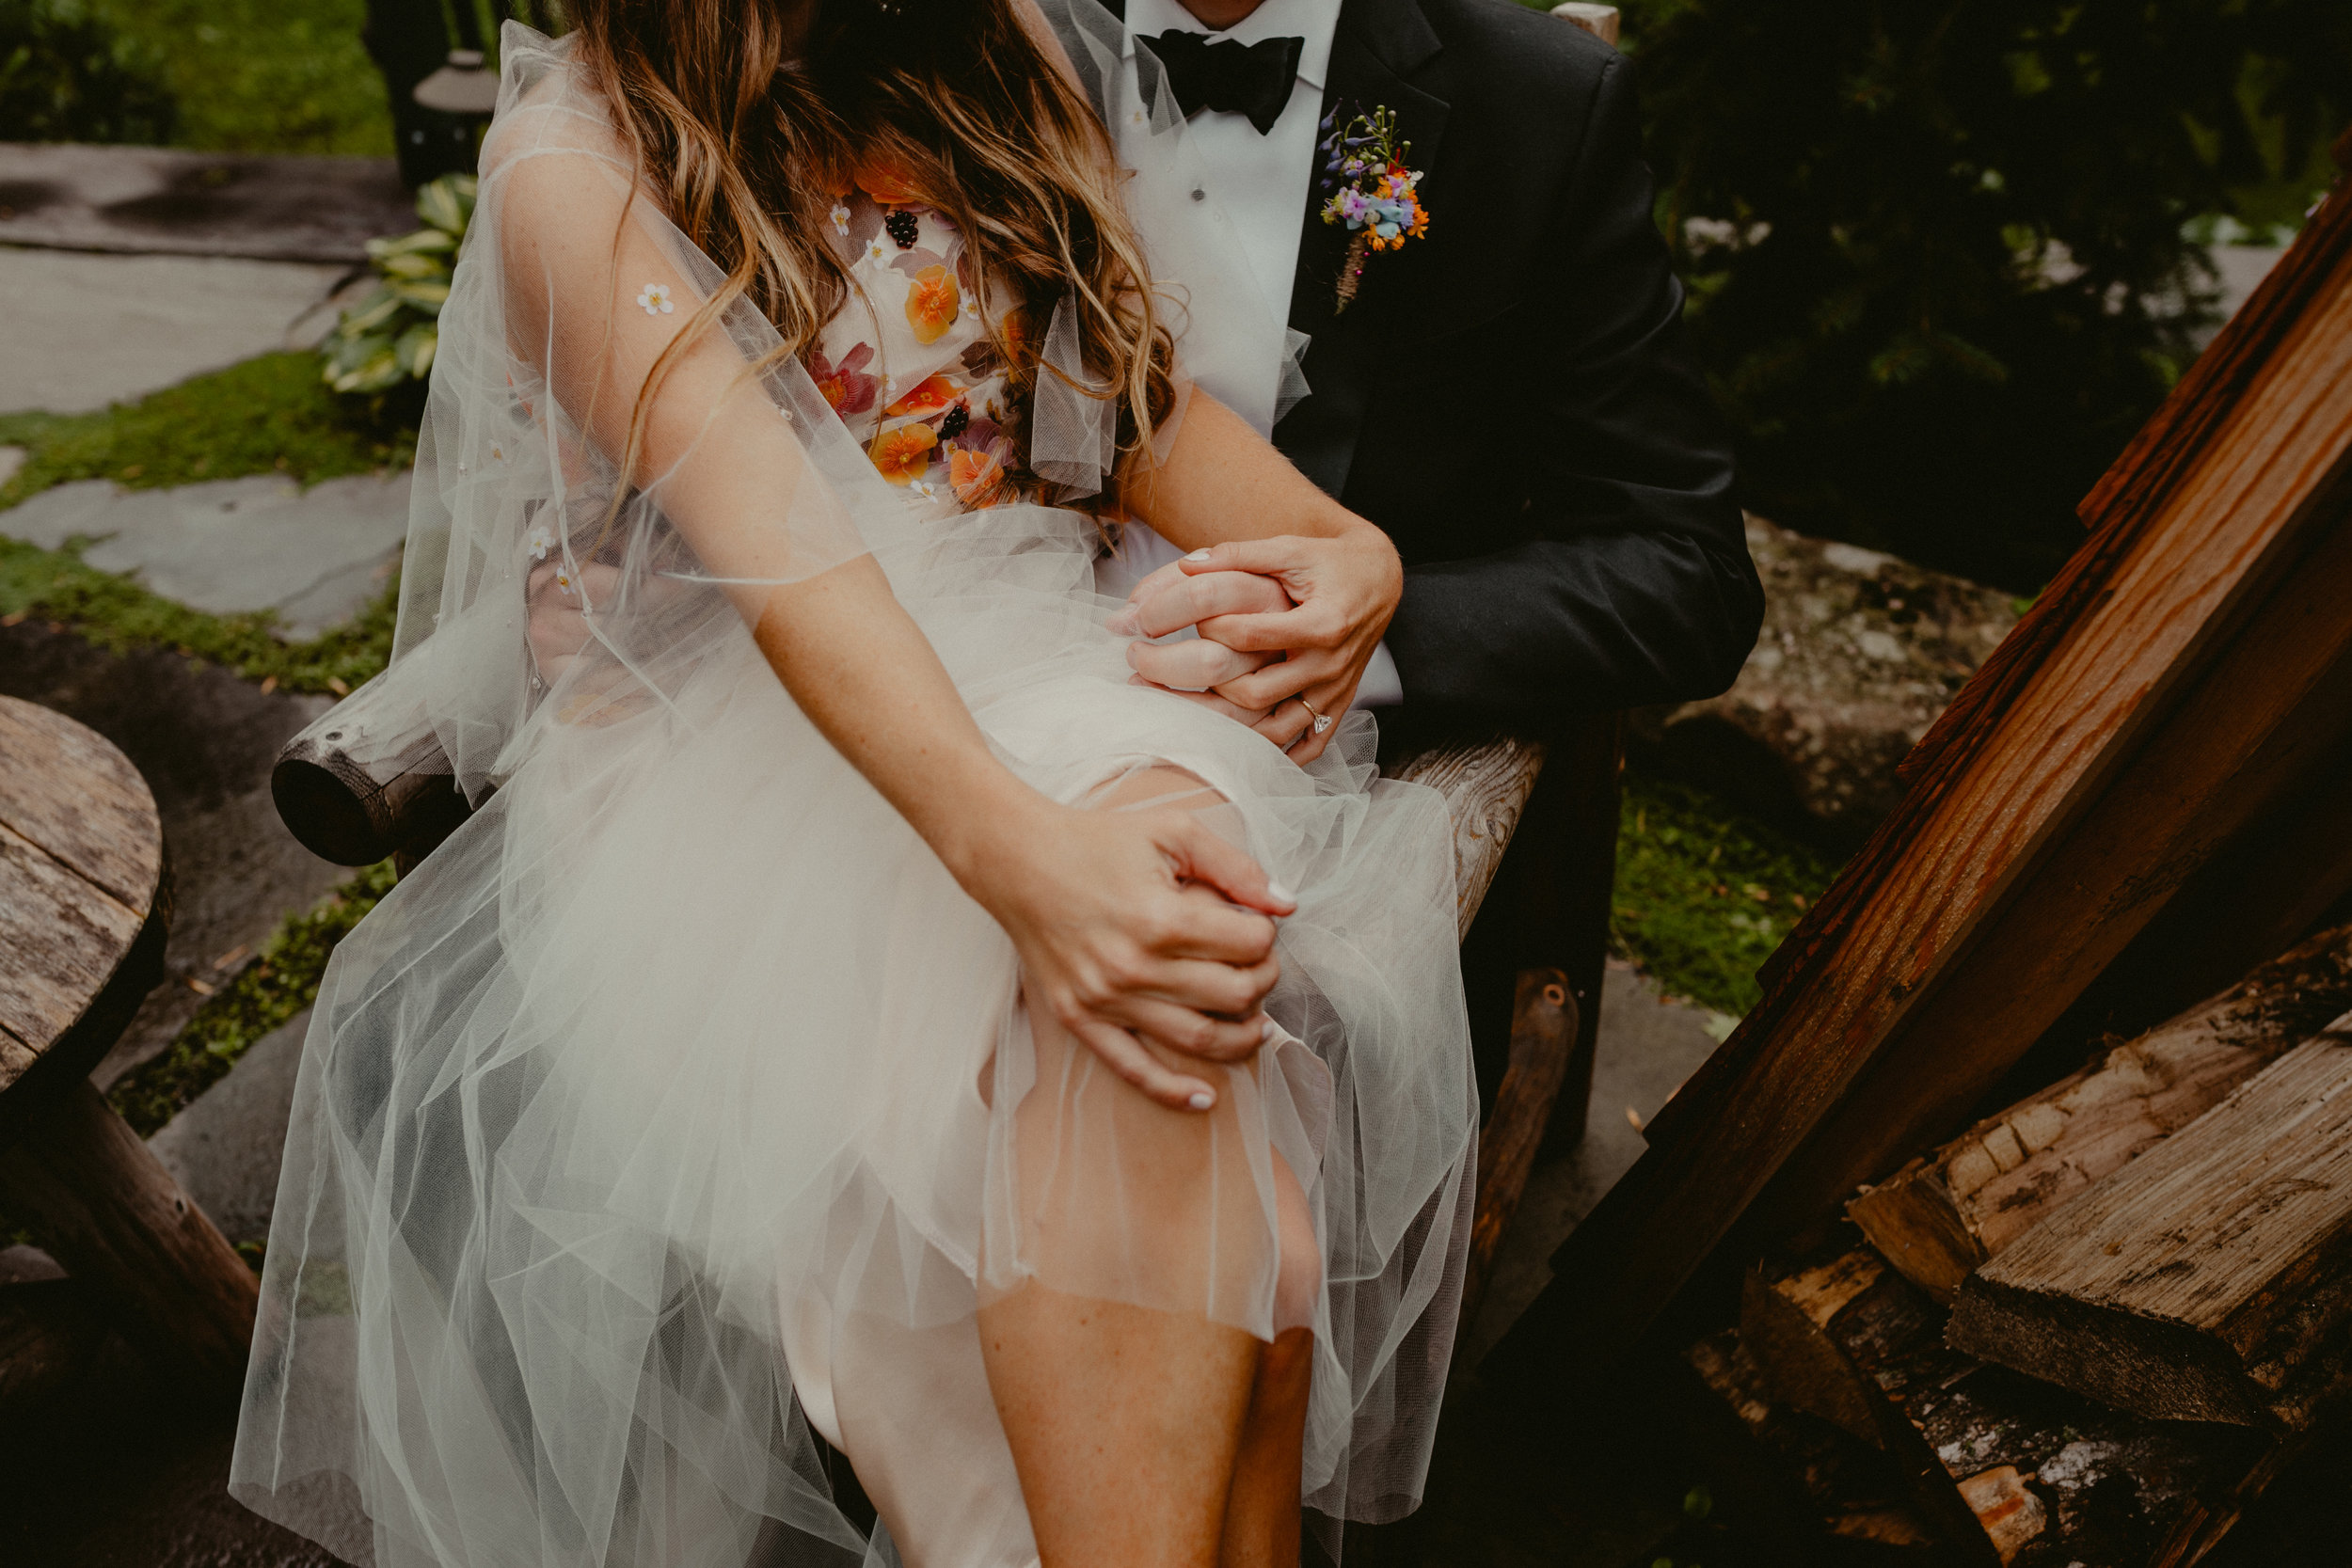 DEER_MOUNTAIN_INN_WEDDING_CHELLISE_MICHAEL_PHOTOGRAPHY-1202.jpg